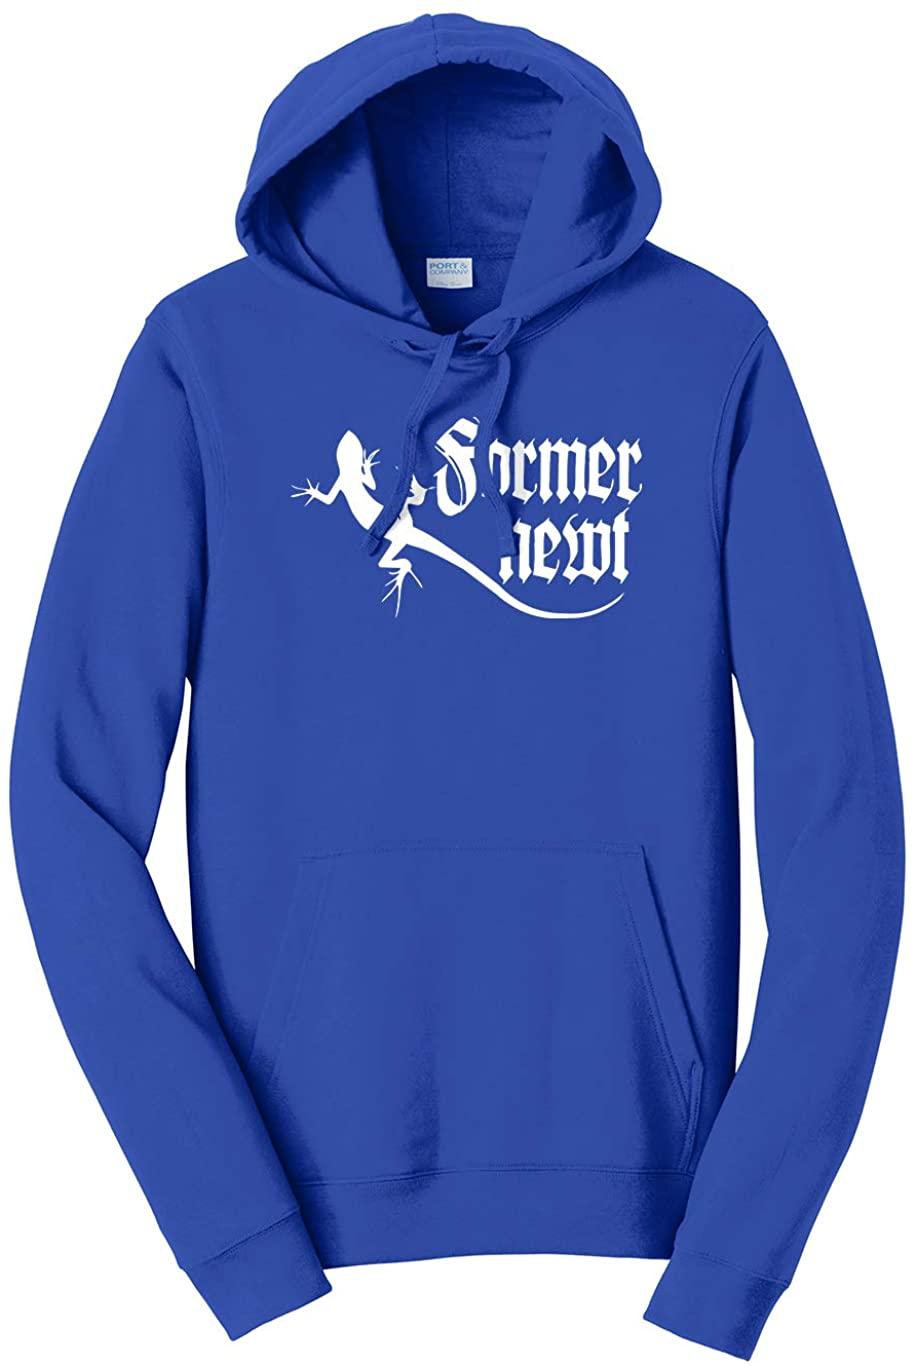 Tenacitee Unisex Former Newt Hooded Sweatshirt